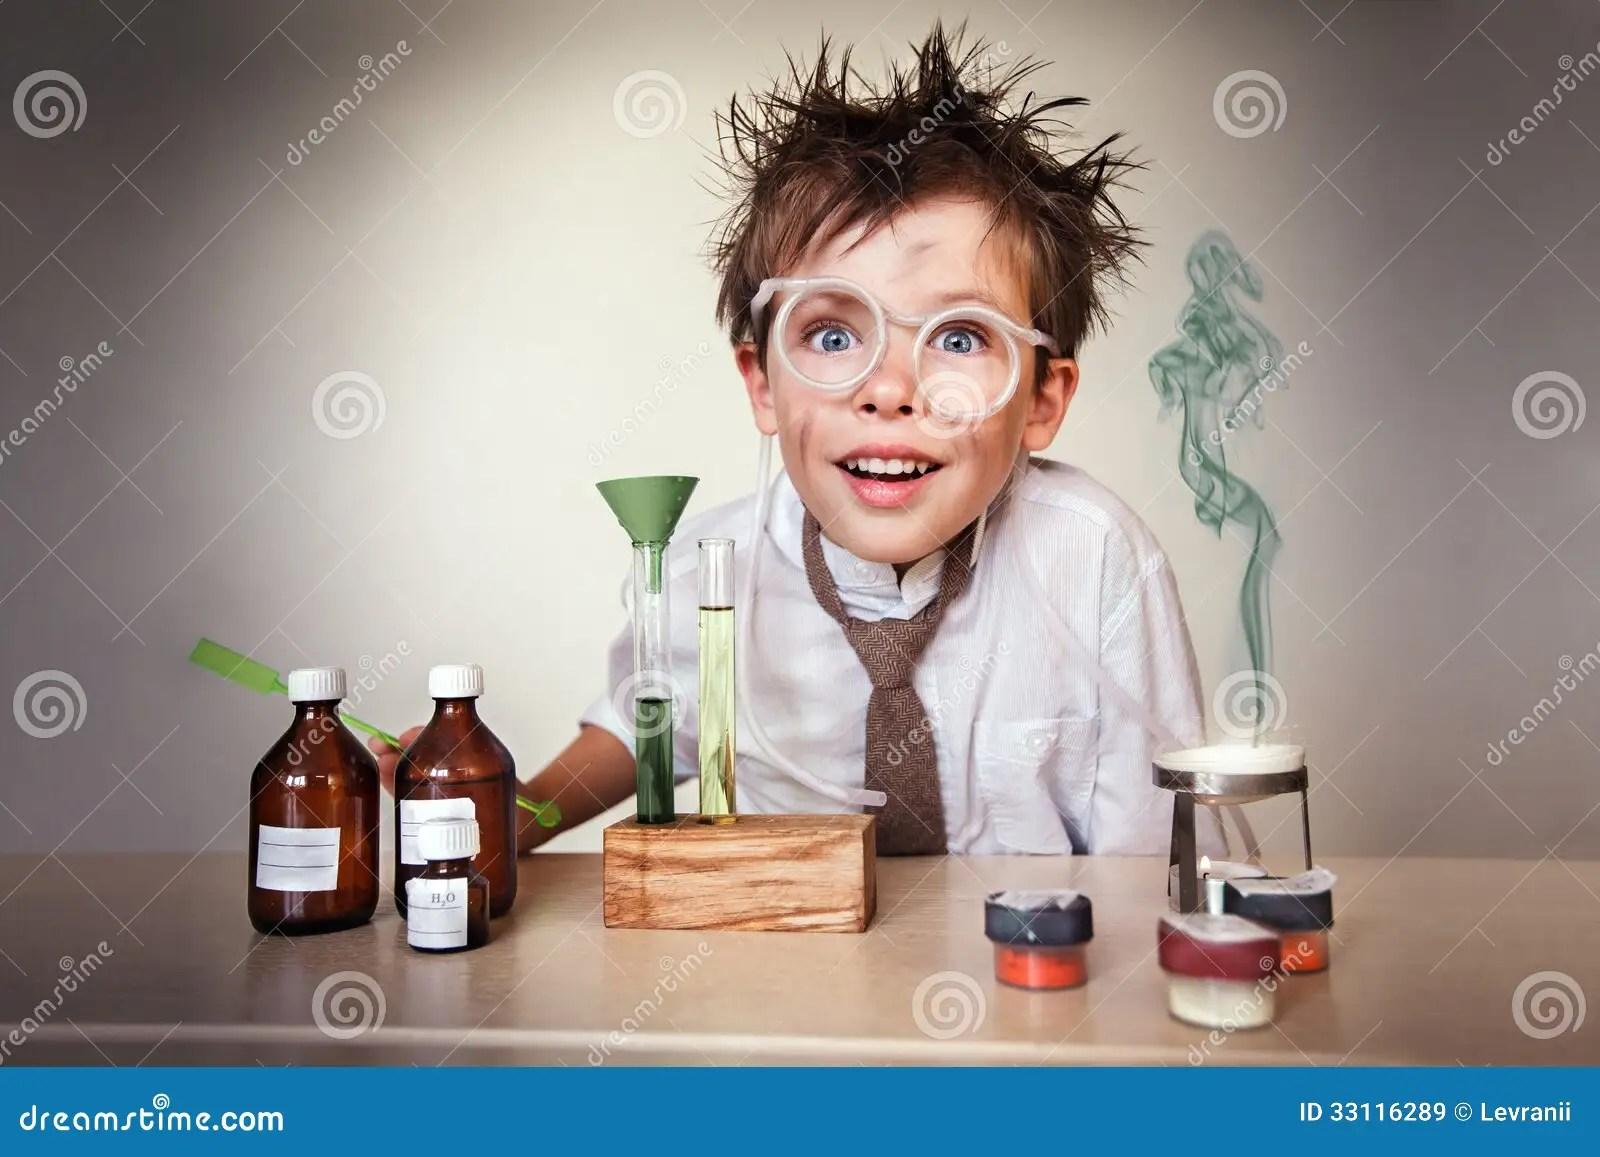 School Chemistry Lab Equipment Names